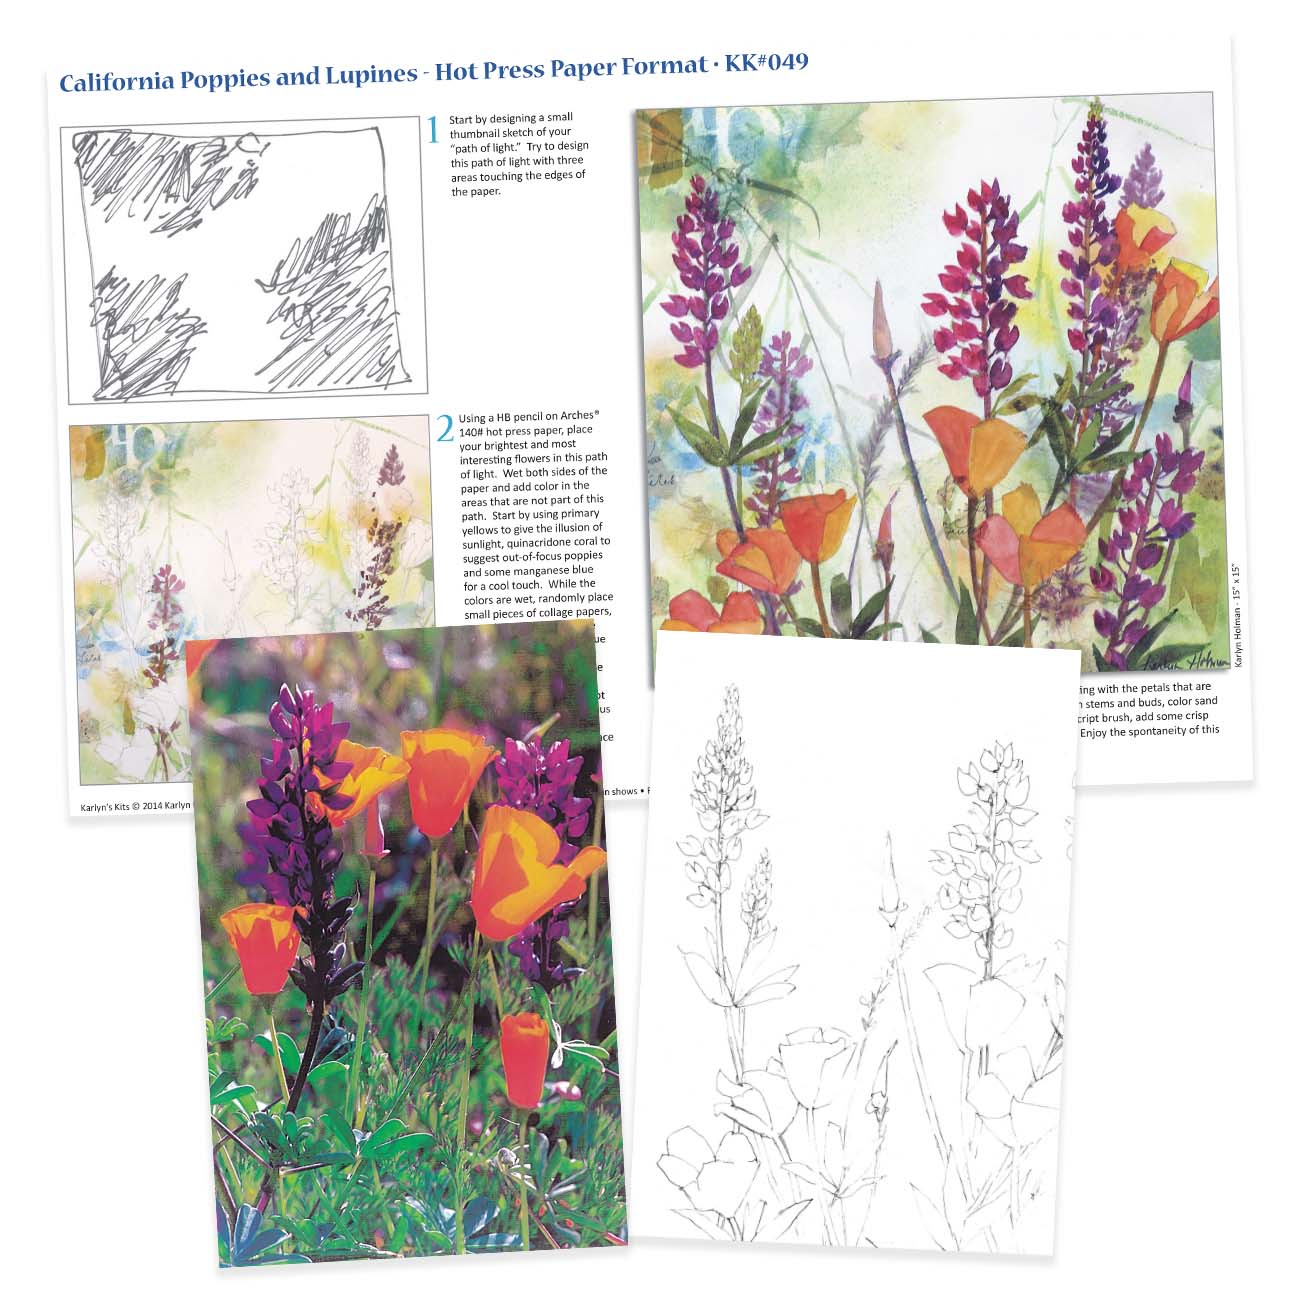 KK049 California Poppies & Lupines on Hot Press Paper